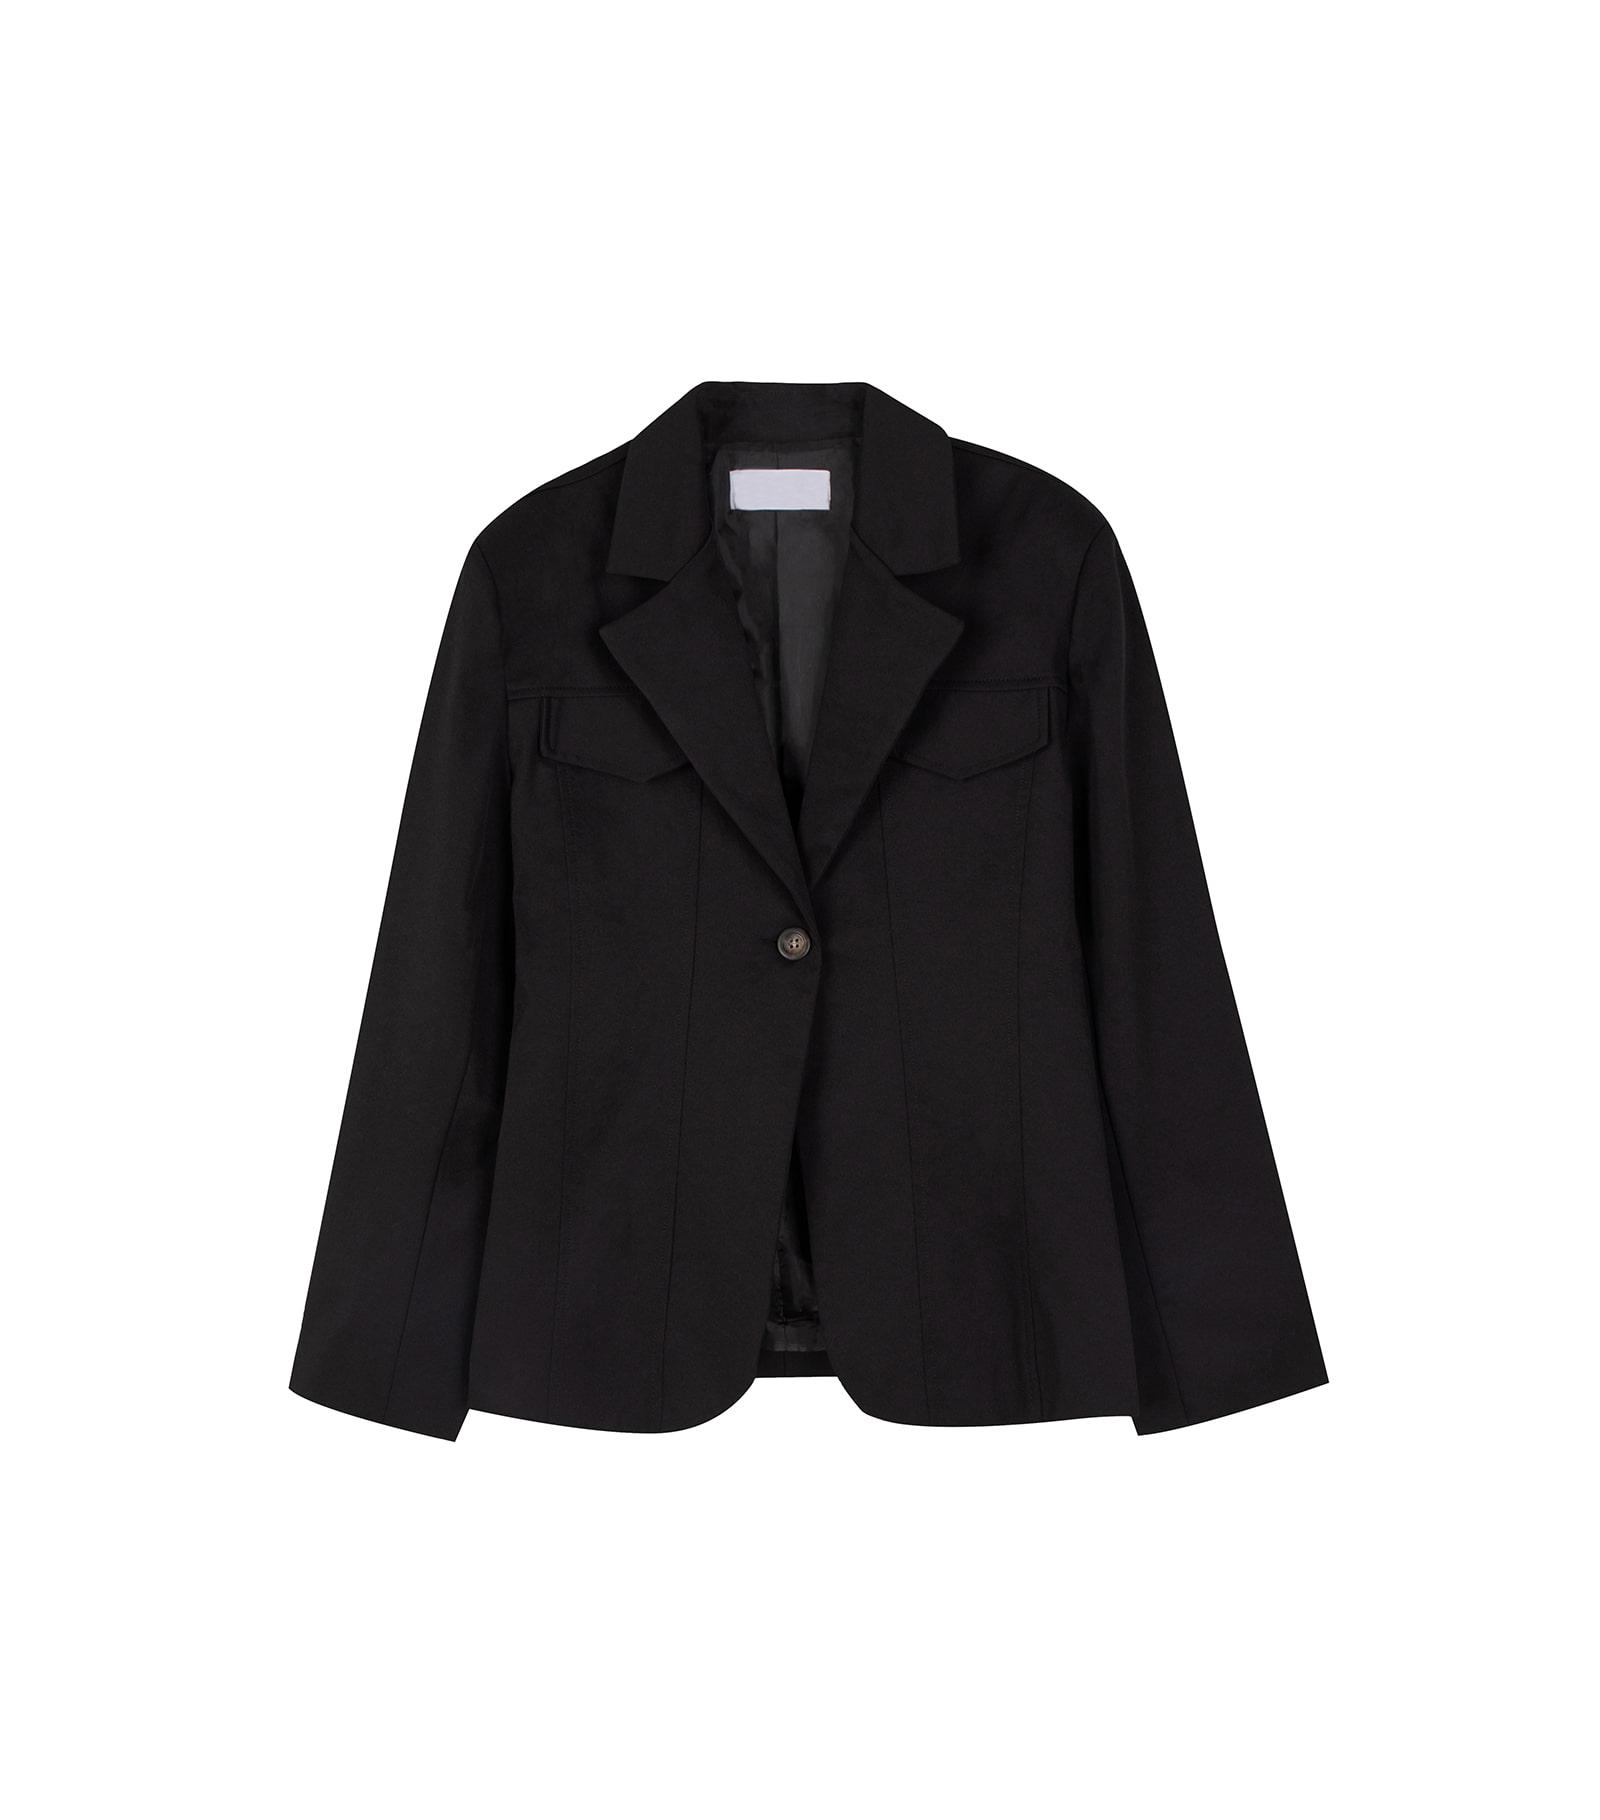 Fran line single jacket